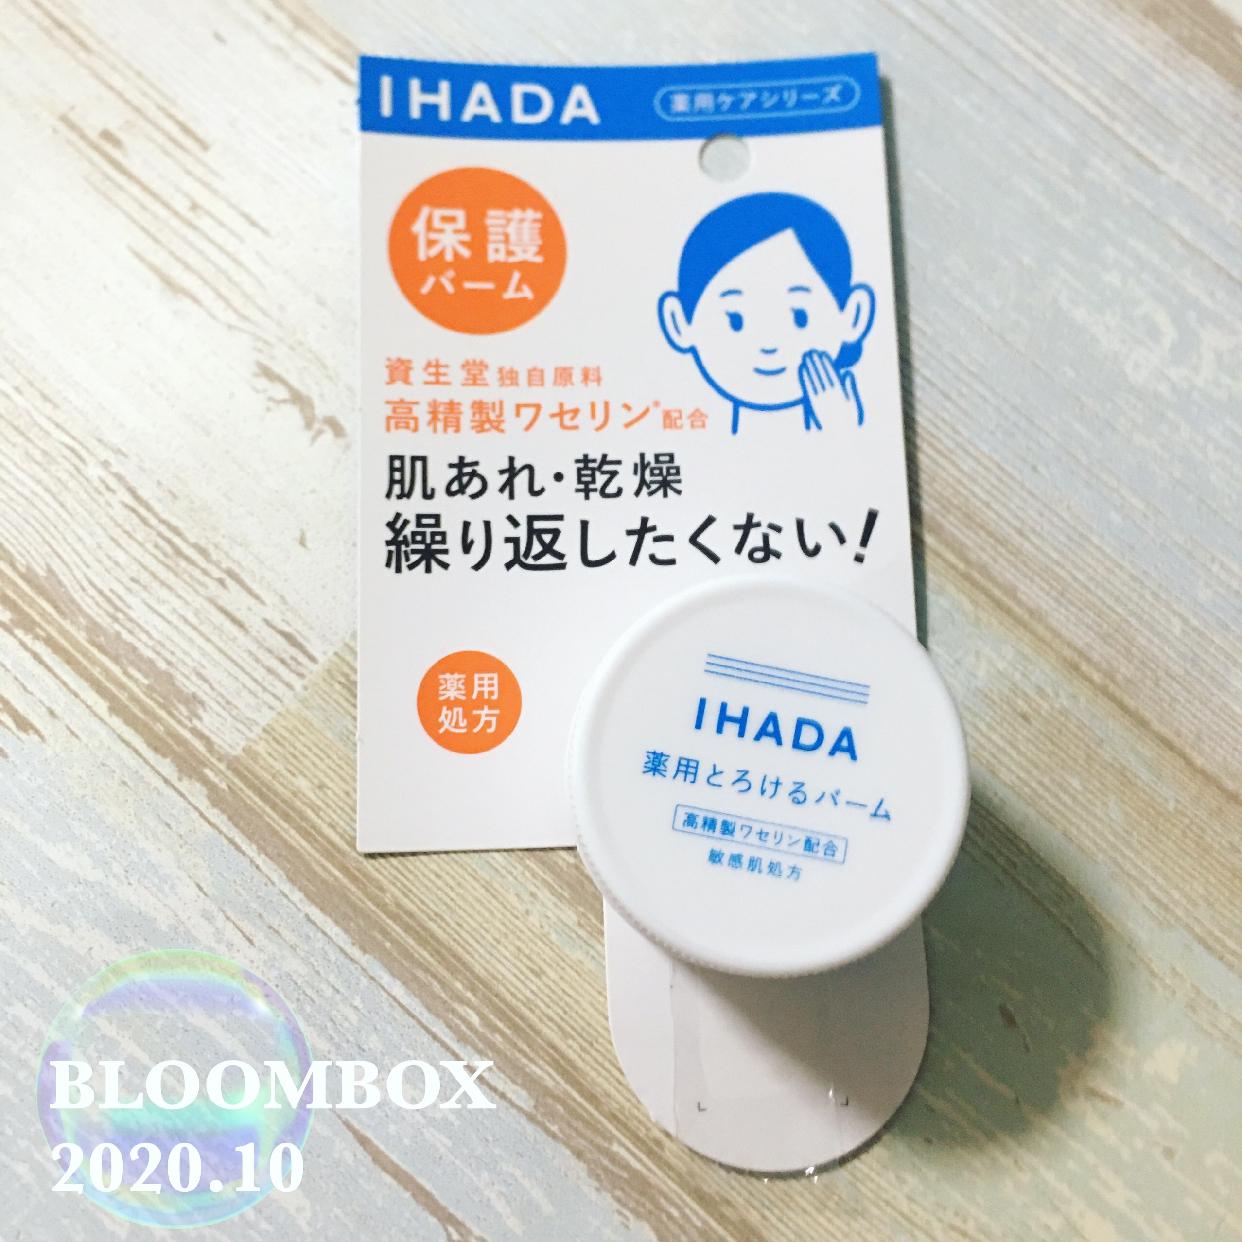 IHADA(イハダ) 薬用バームを使った有姫さんのクチコミ画像1